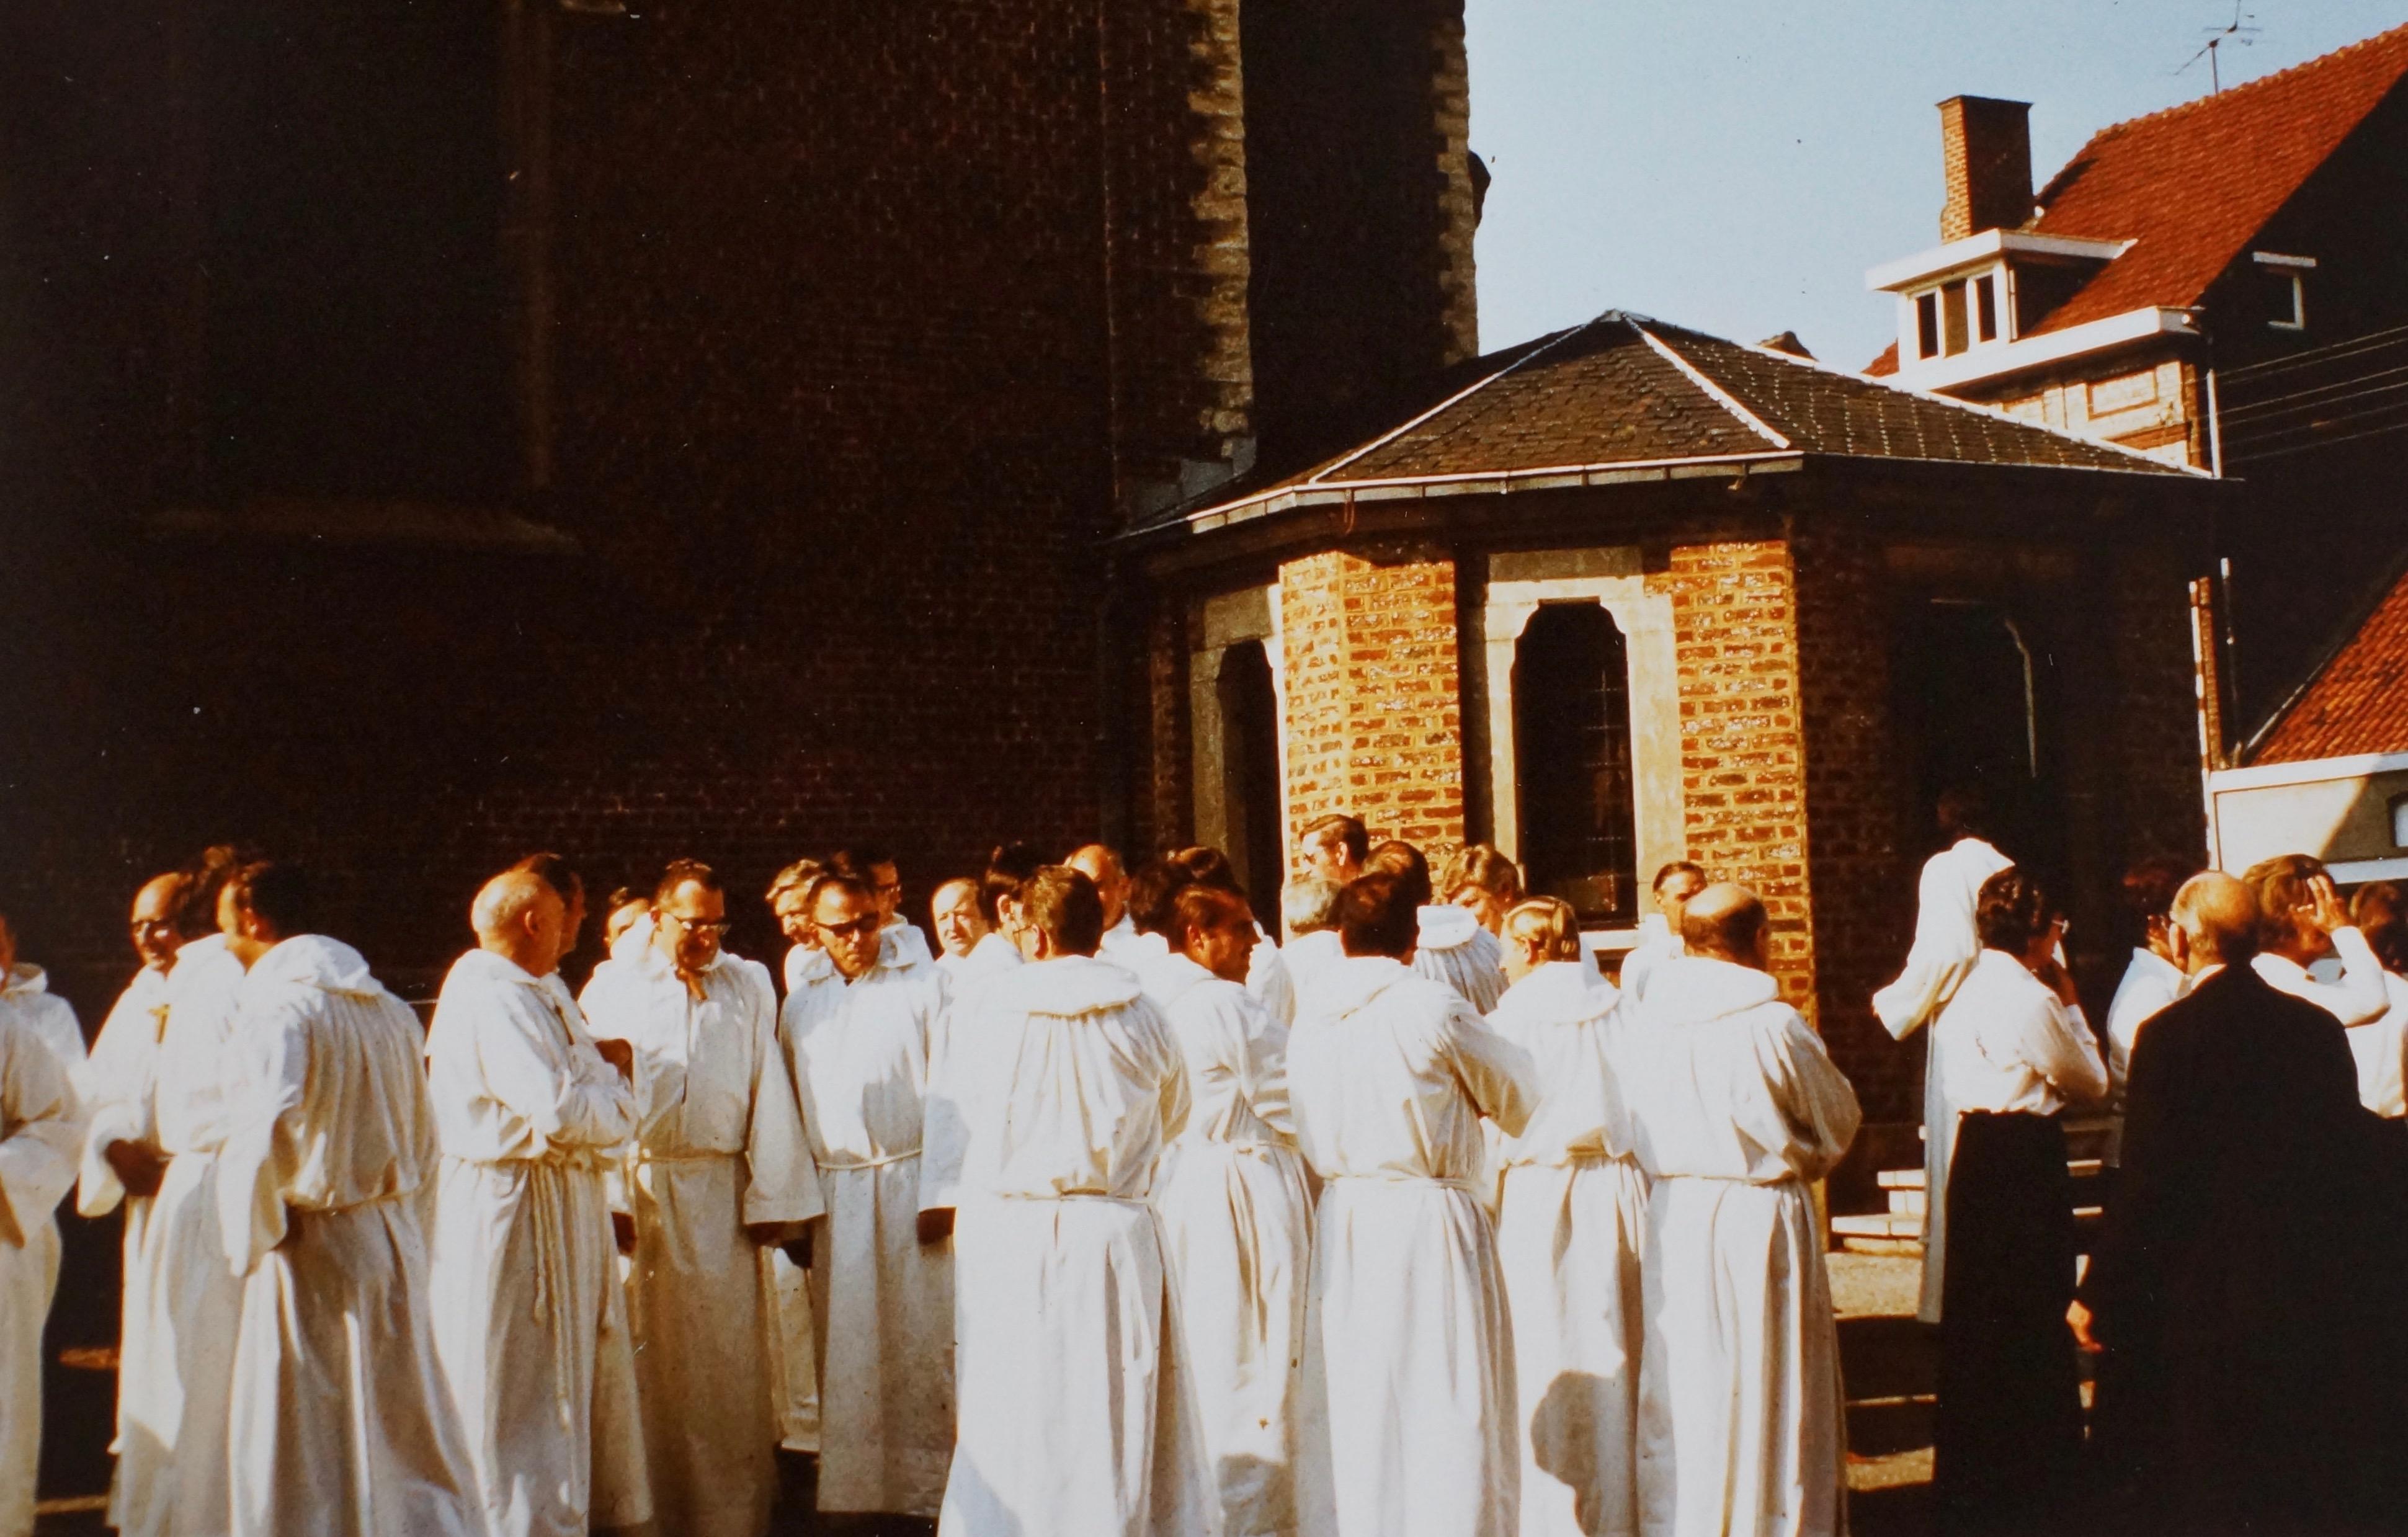 1982 Cinquantenaire de la Chorale de Bourgeois coll. Philippe Sterckx 1